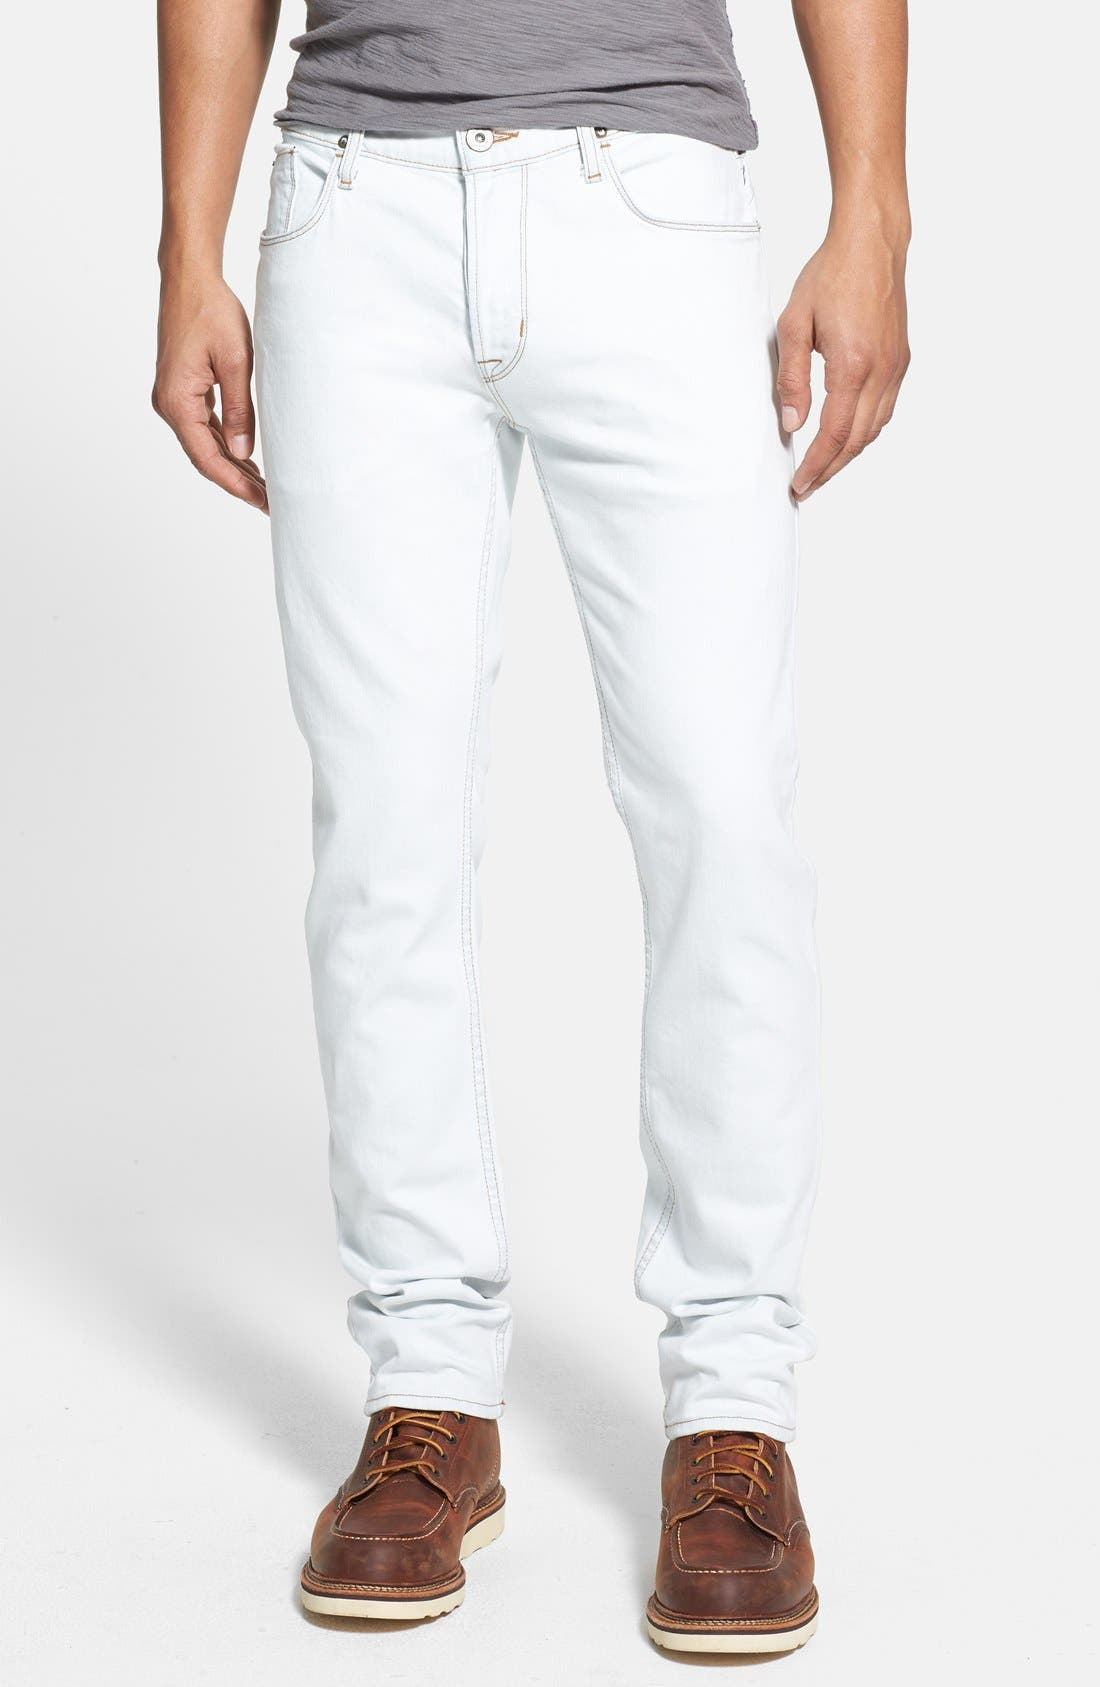 Main Image - Hudson Jeans 'Sartor' Slouchy Skinny Fit Jeans (Flashback)